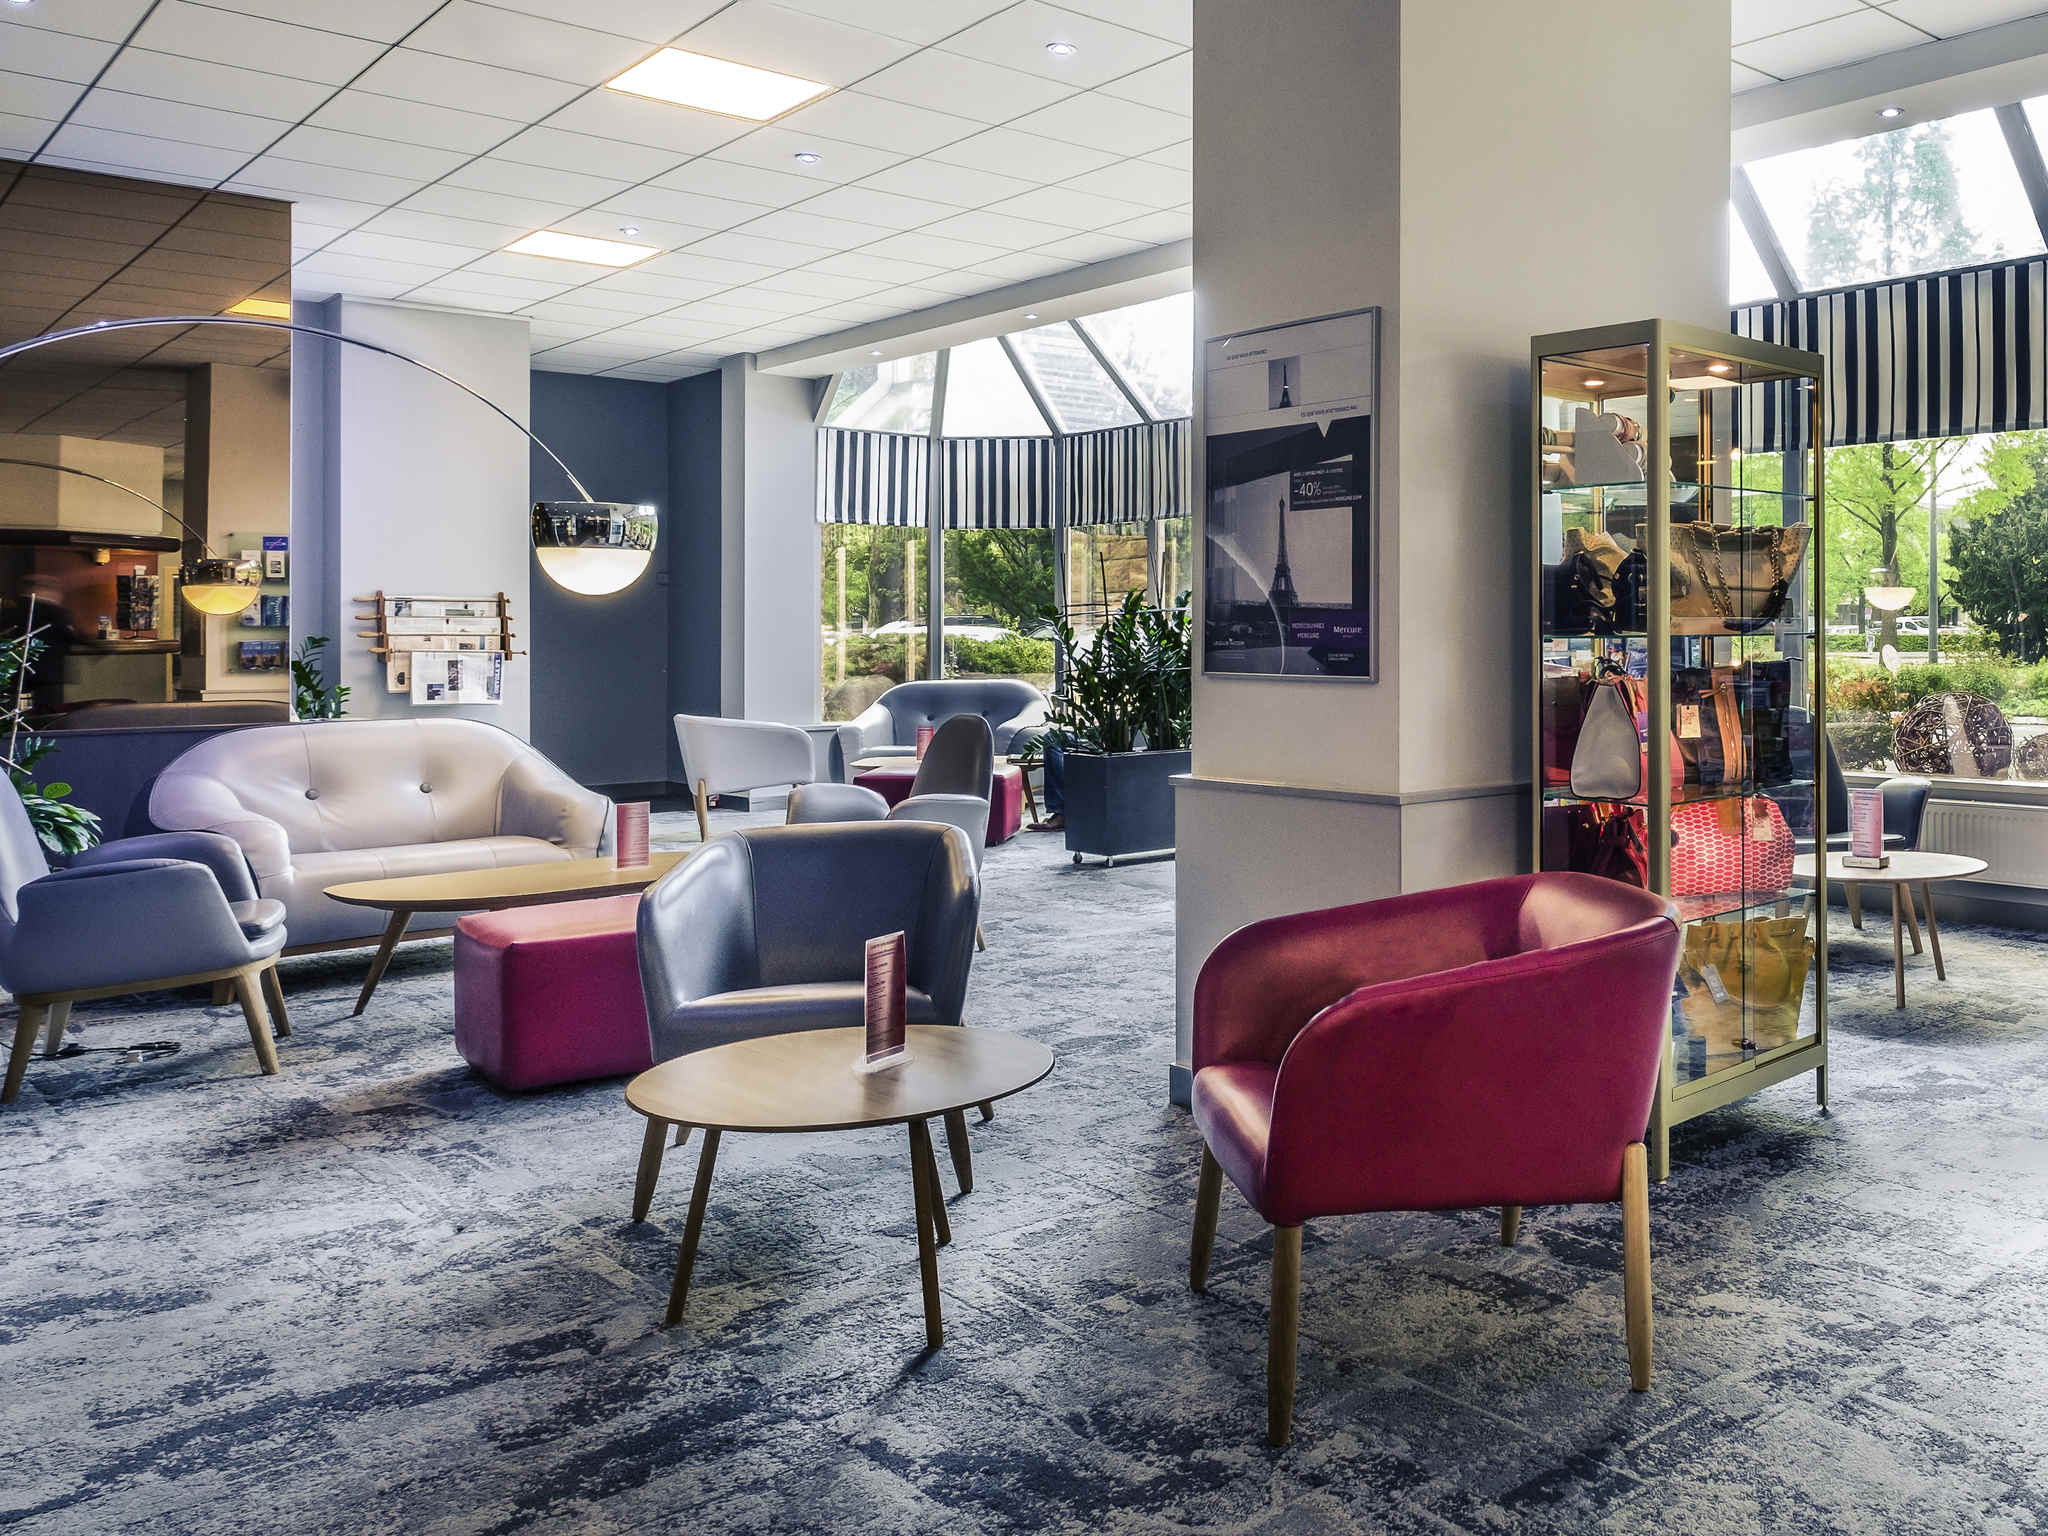 Hotel – Hotel Mercure Strasbourg Palais des Congres